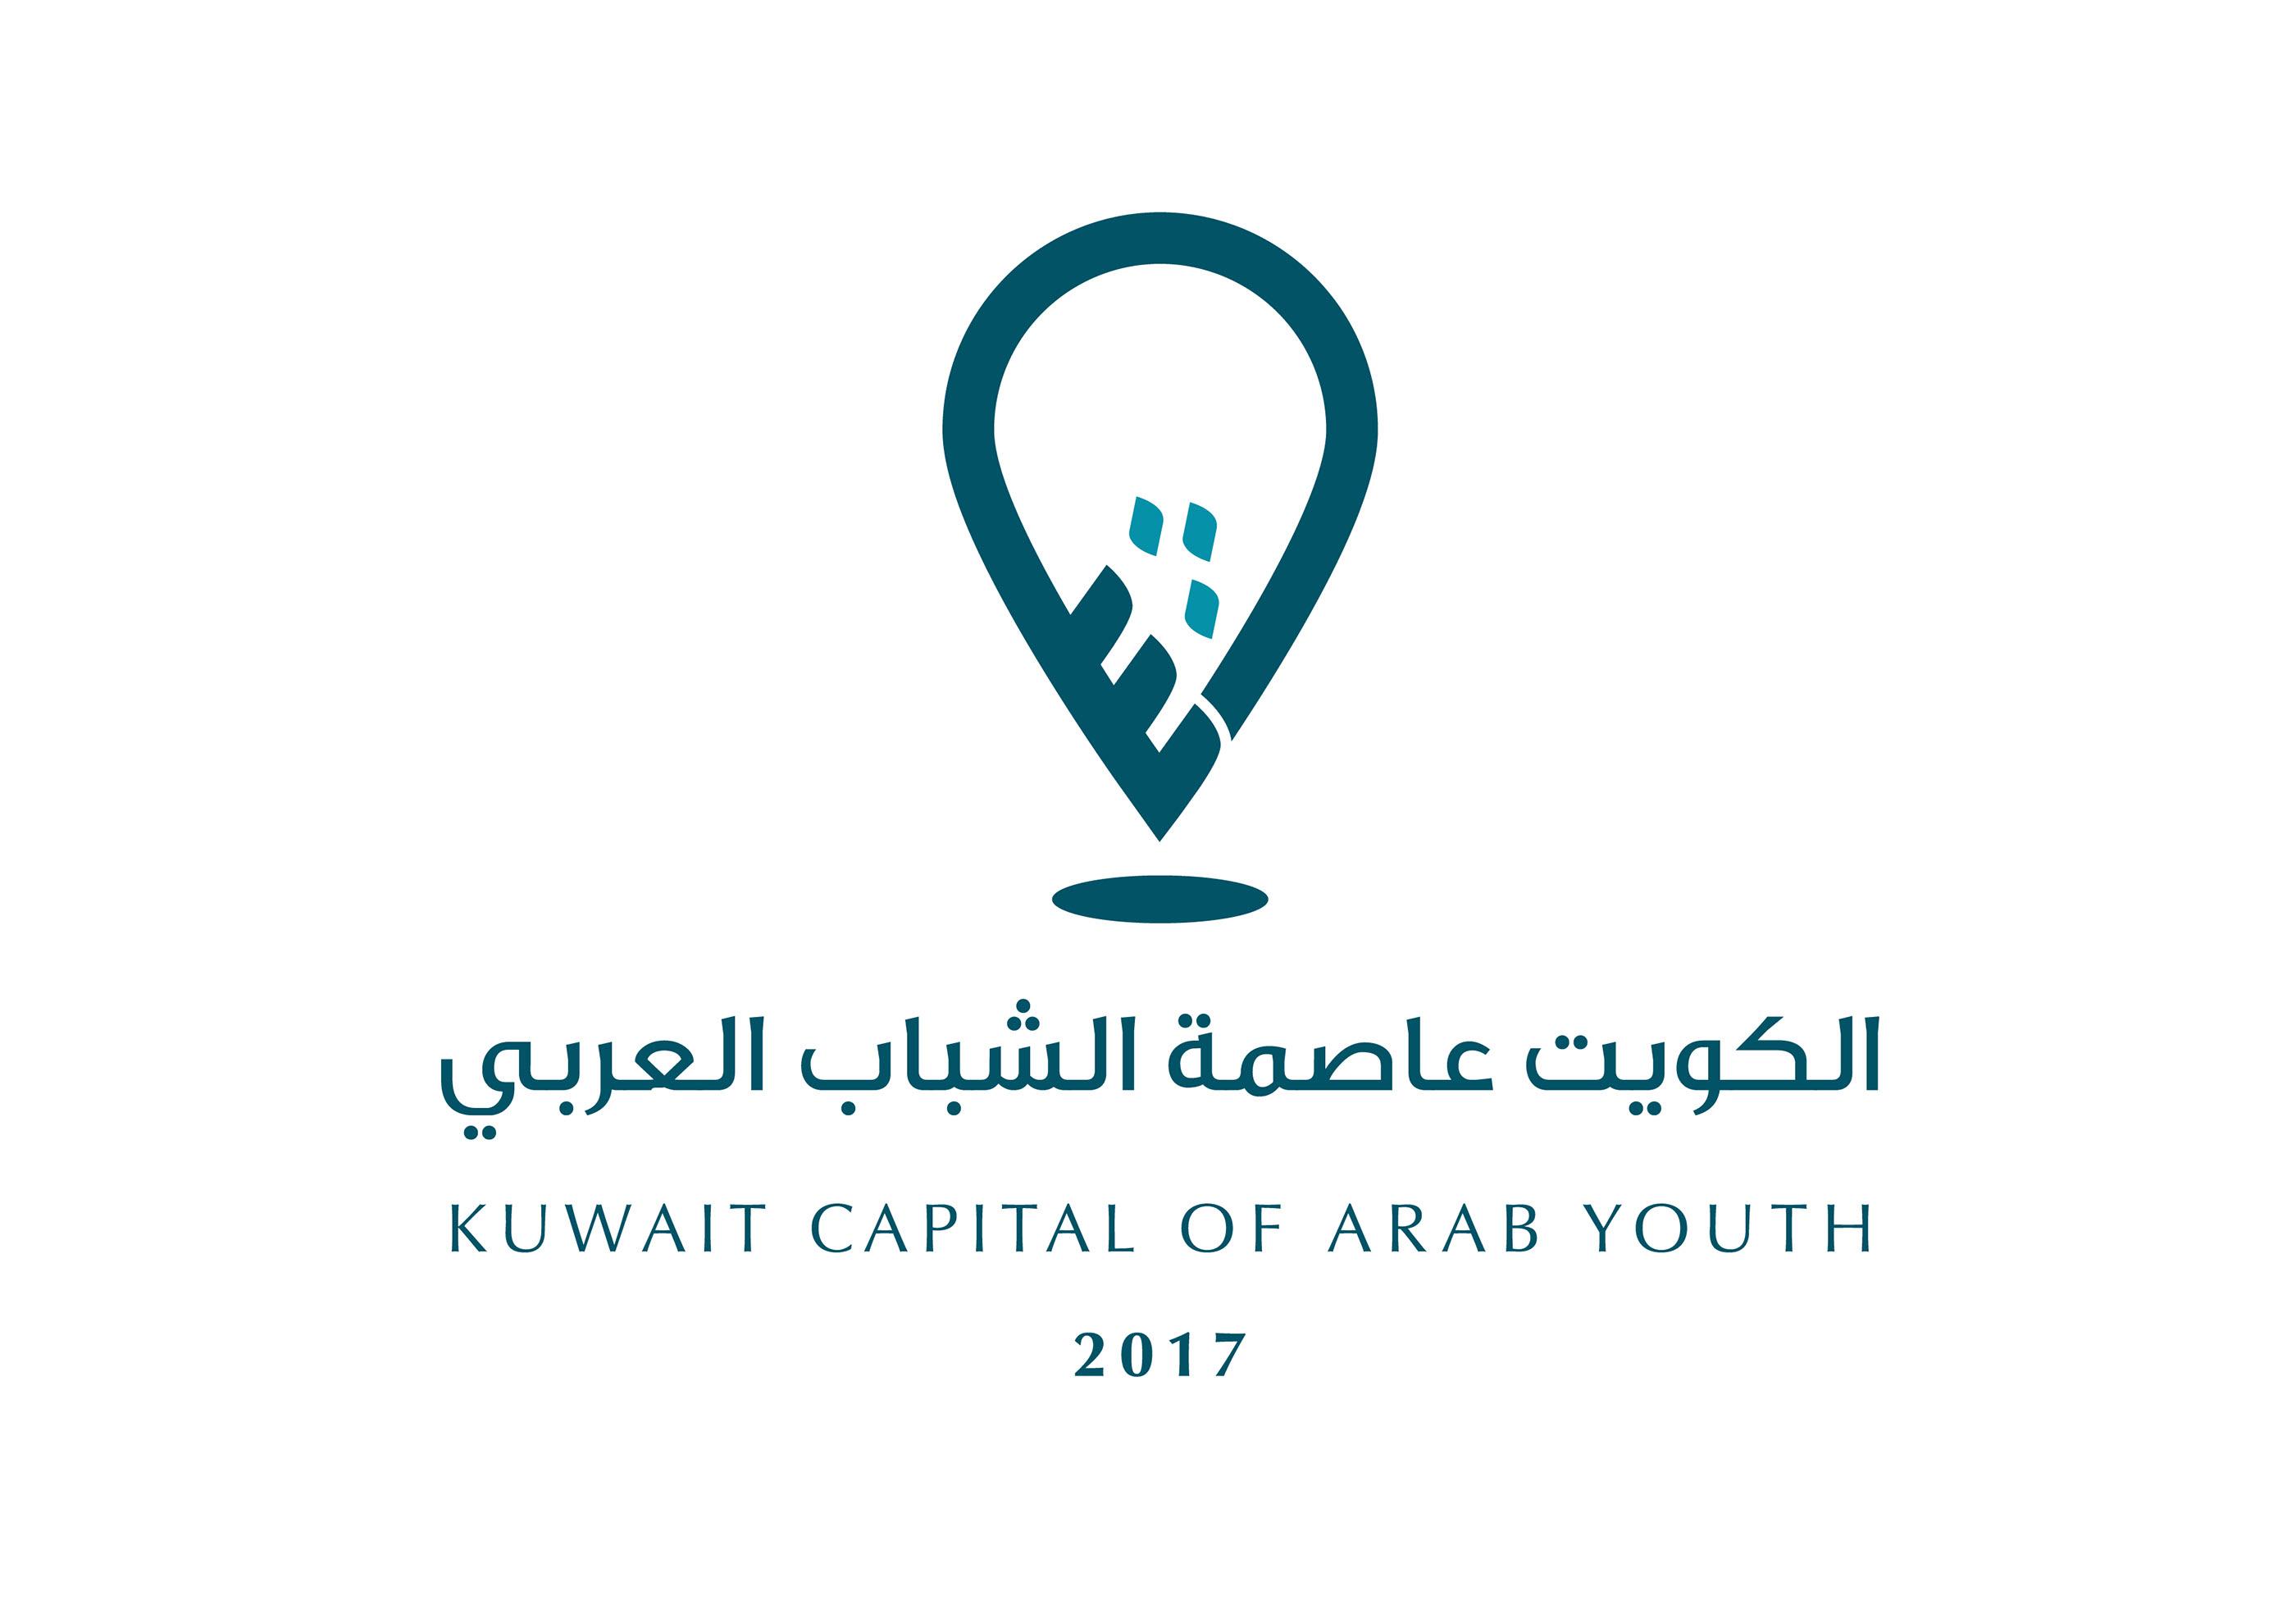 Kuwait Capital of Arab Youth on Behance